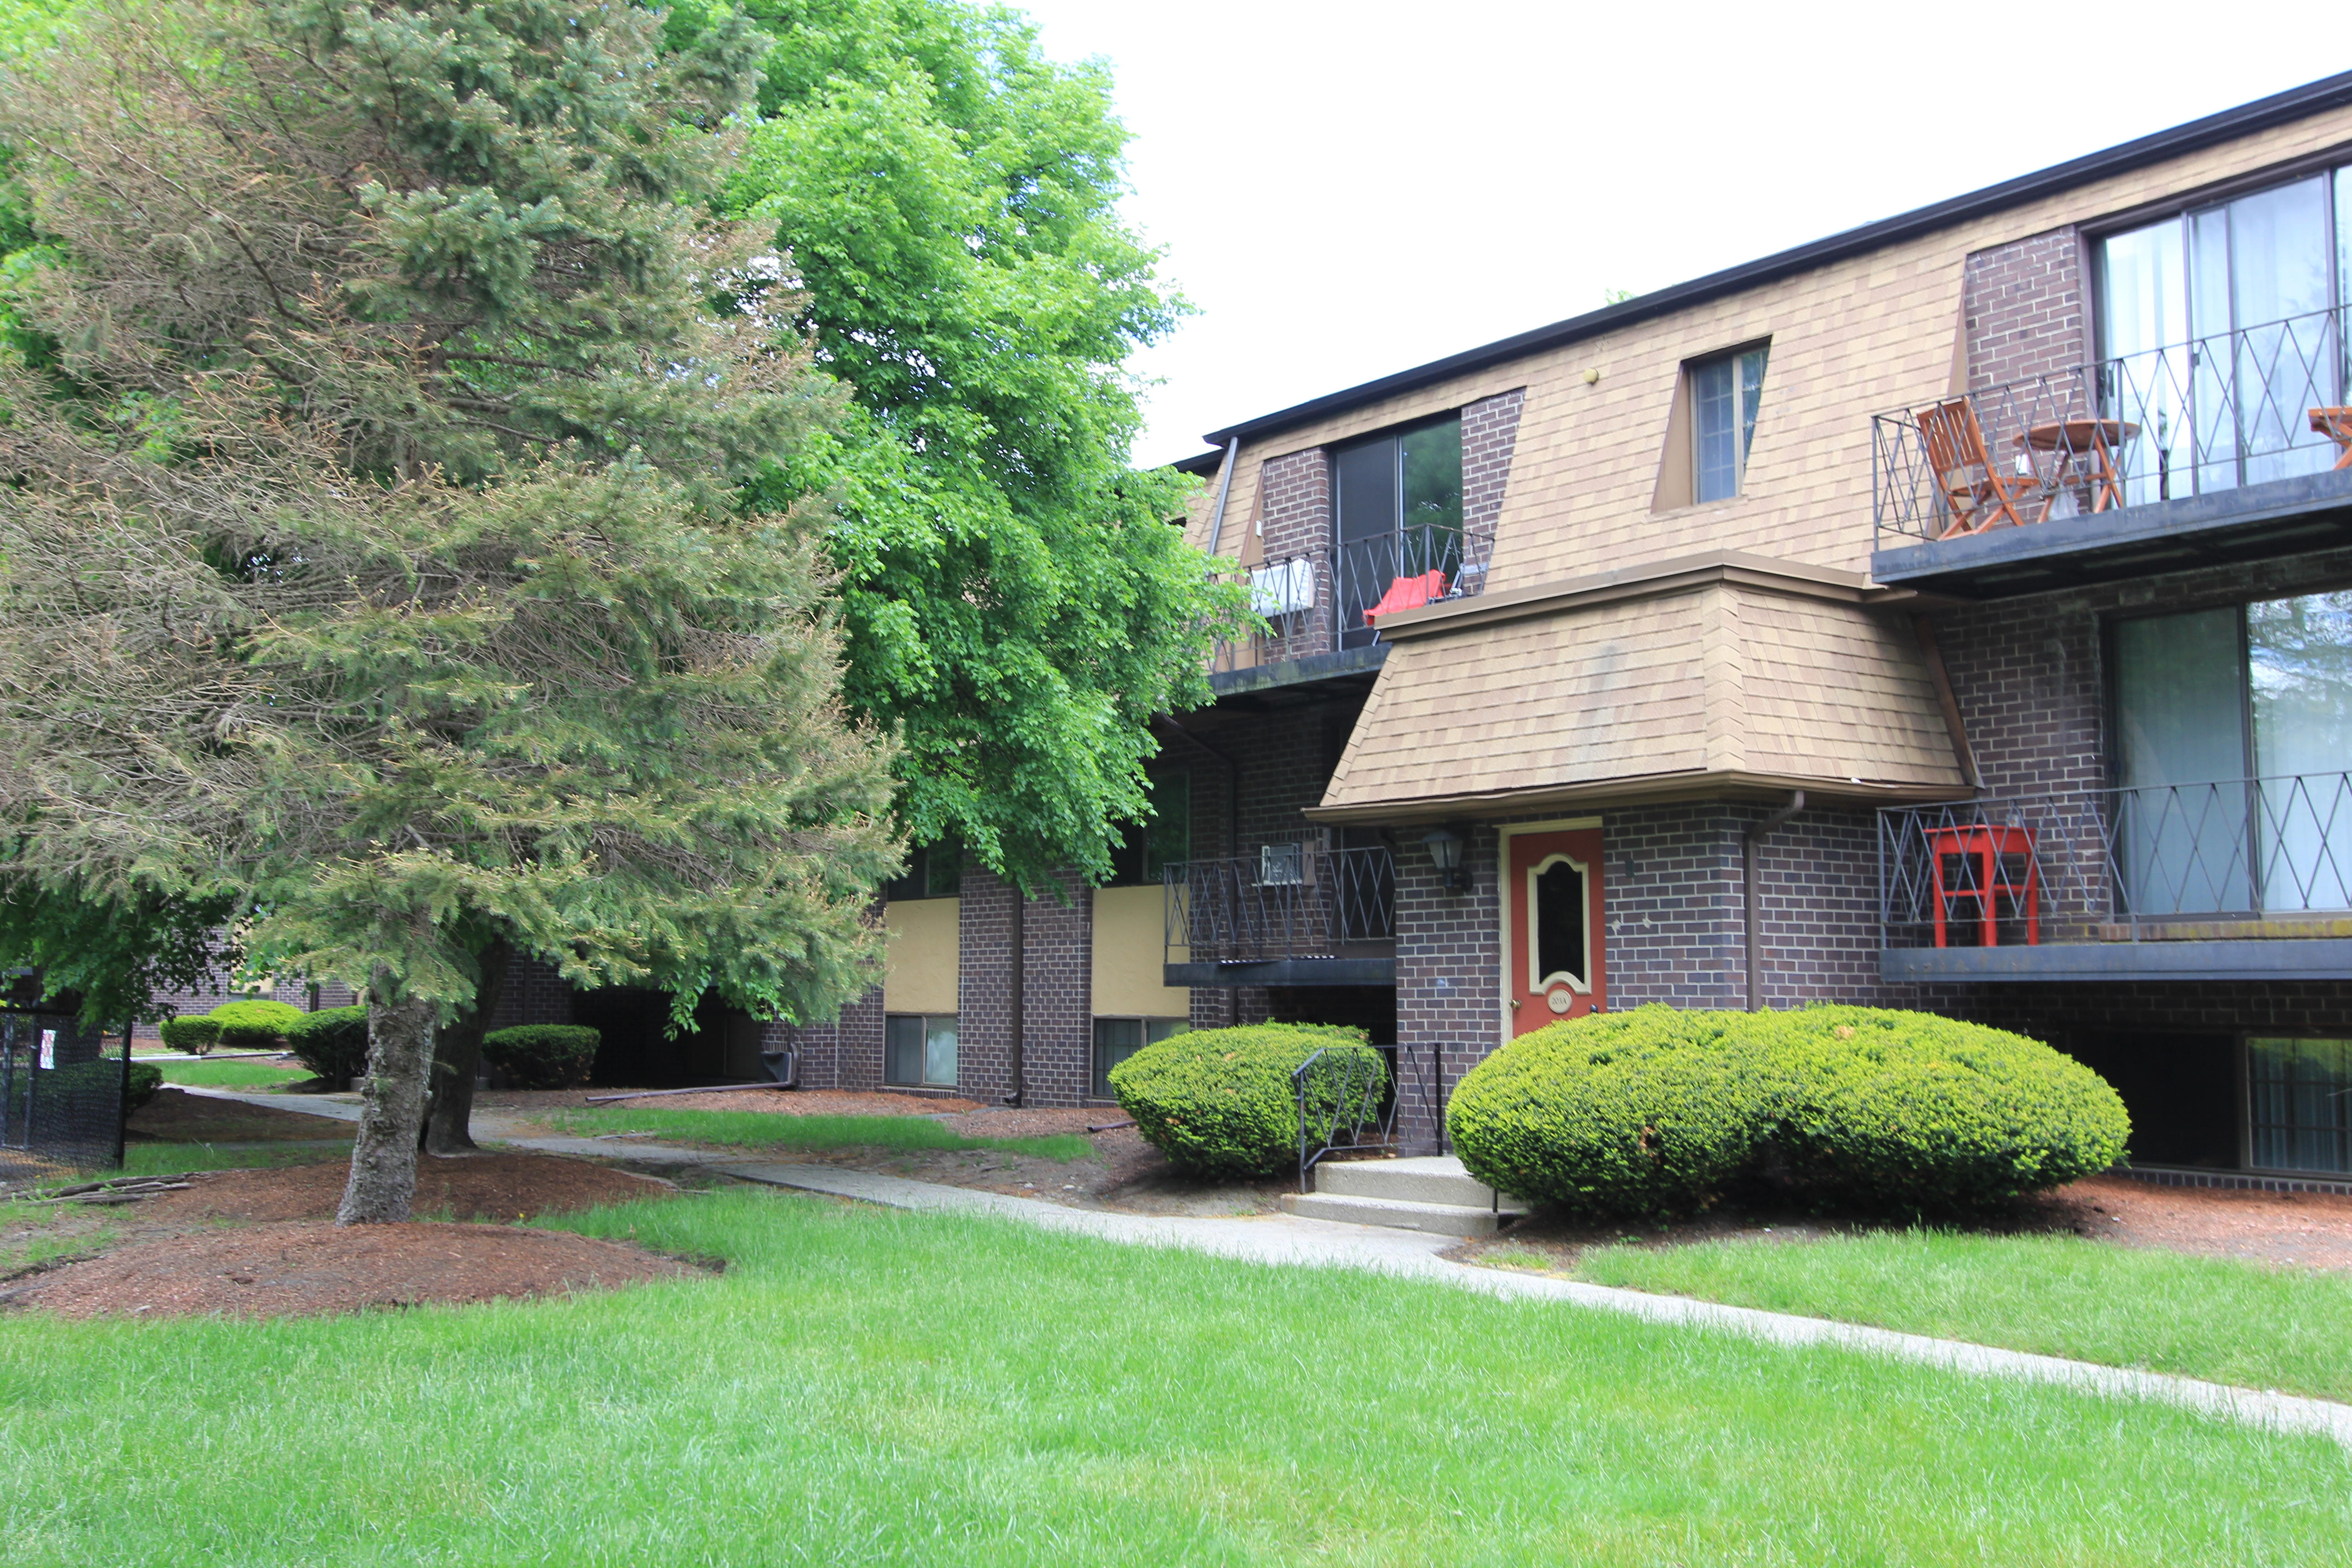 Taunton 2 bedroom rental at 203 207 winthrop st taunton - 2 bedroom apartments in taunton ma ...